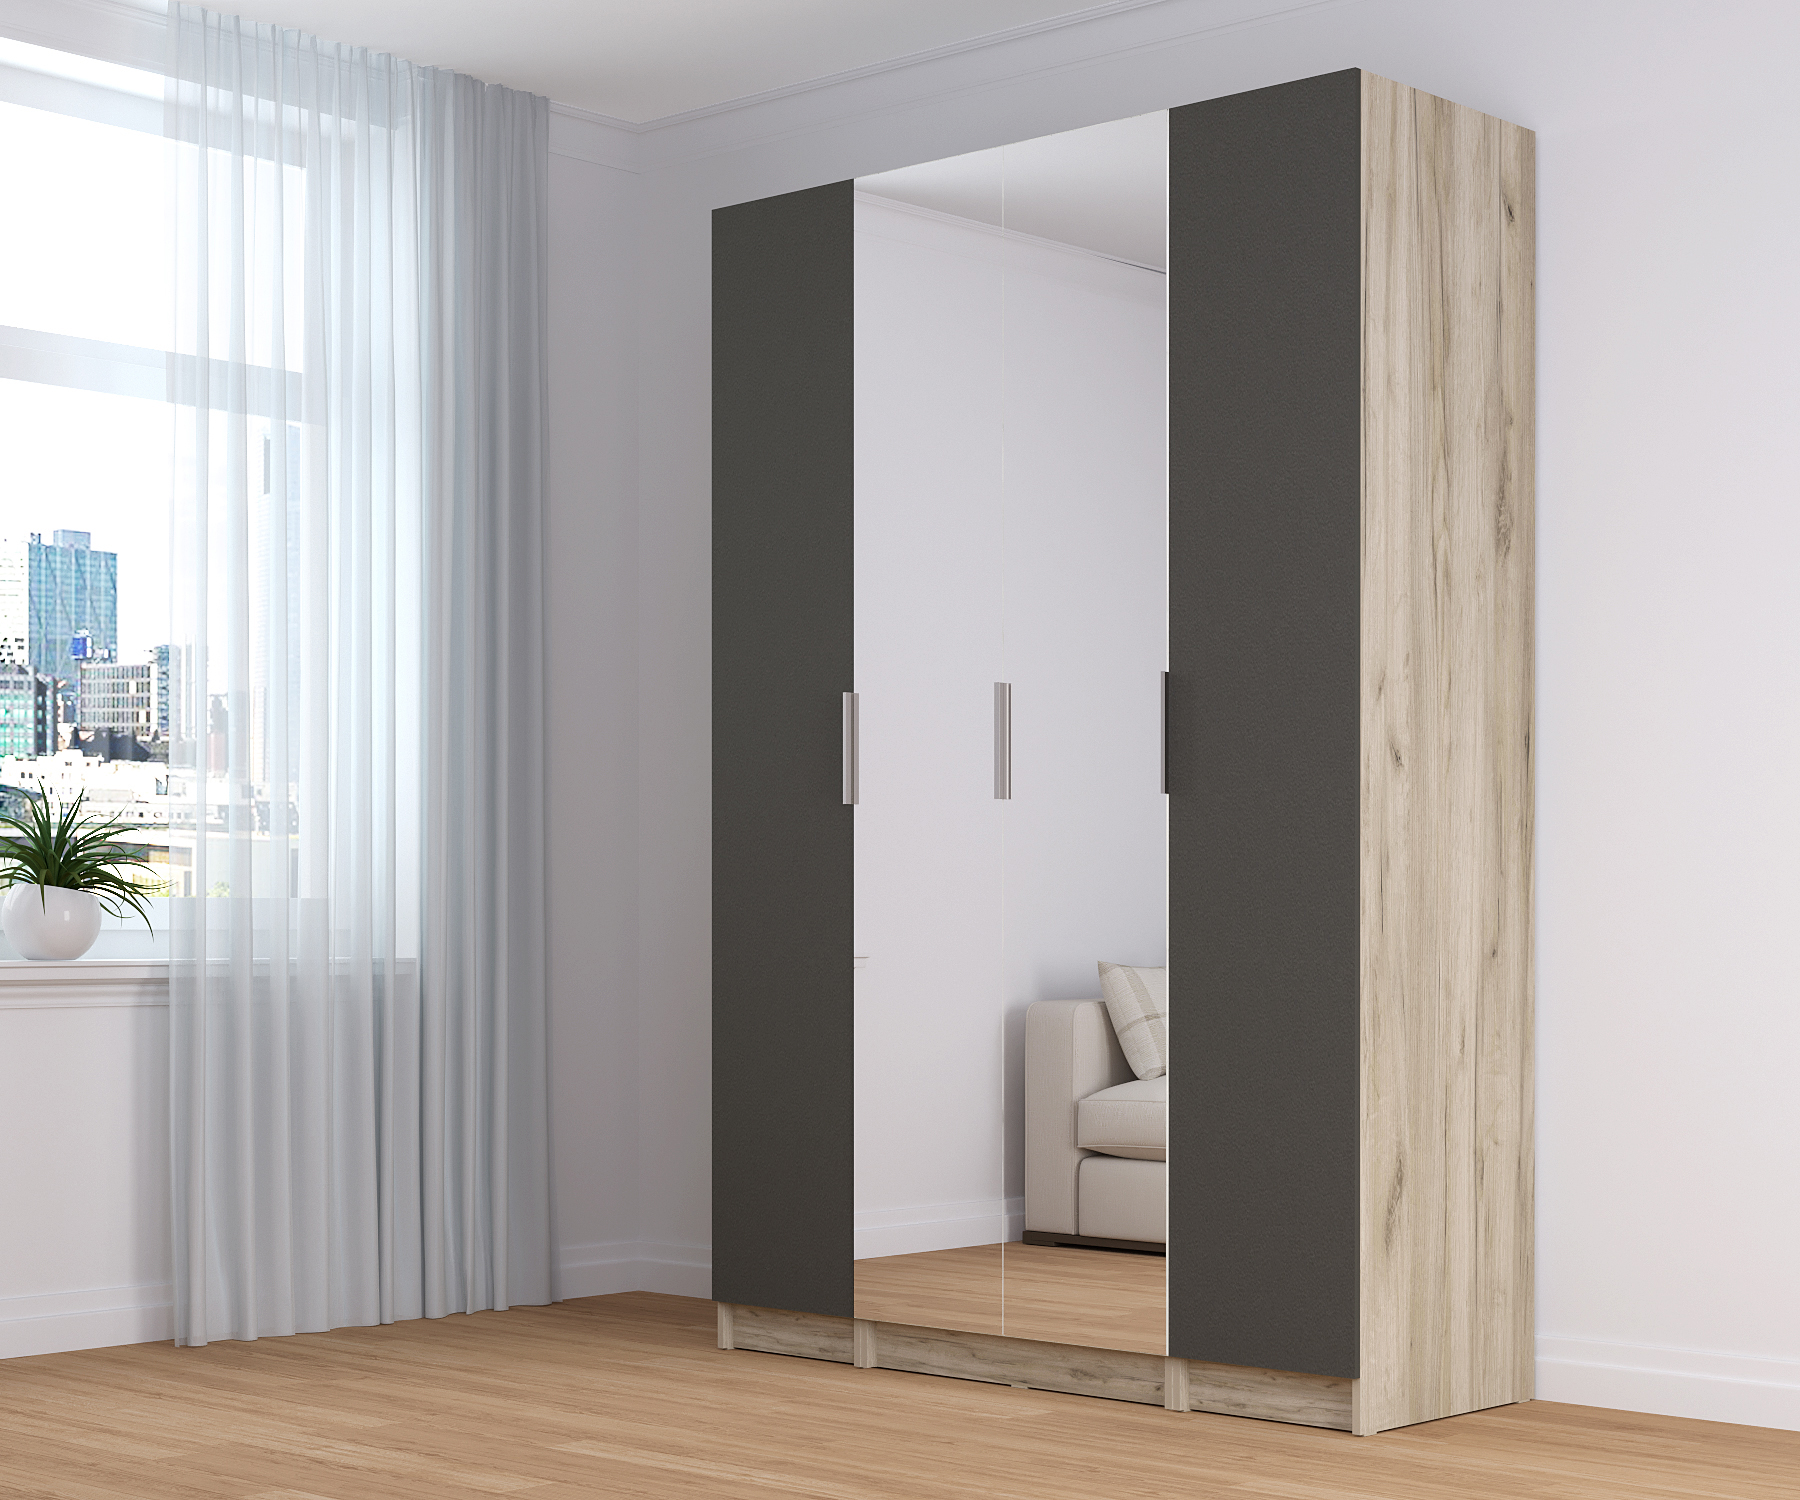 Продажа мебели в интернет-магазине ВашаКомната.РФ – фото 1.41